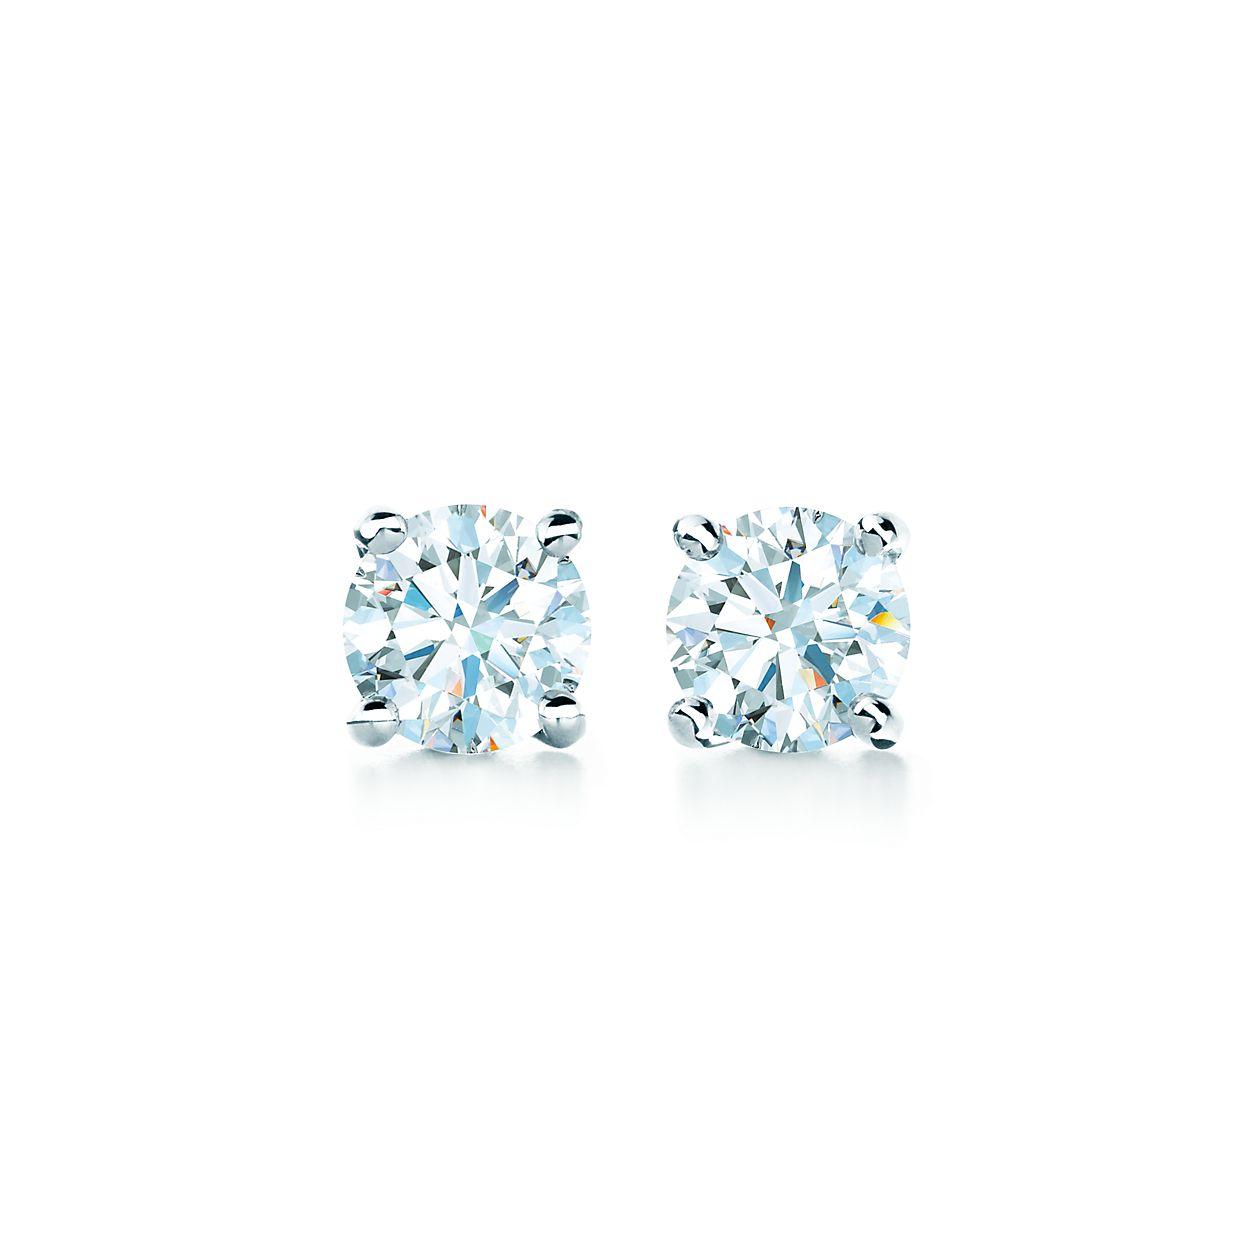 Diamond Earrings in Platinum | Tiffany & Co.